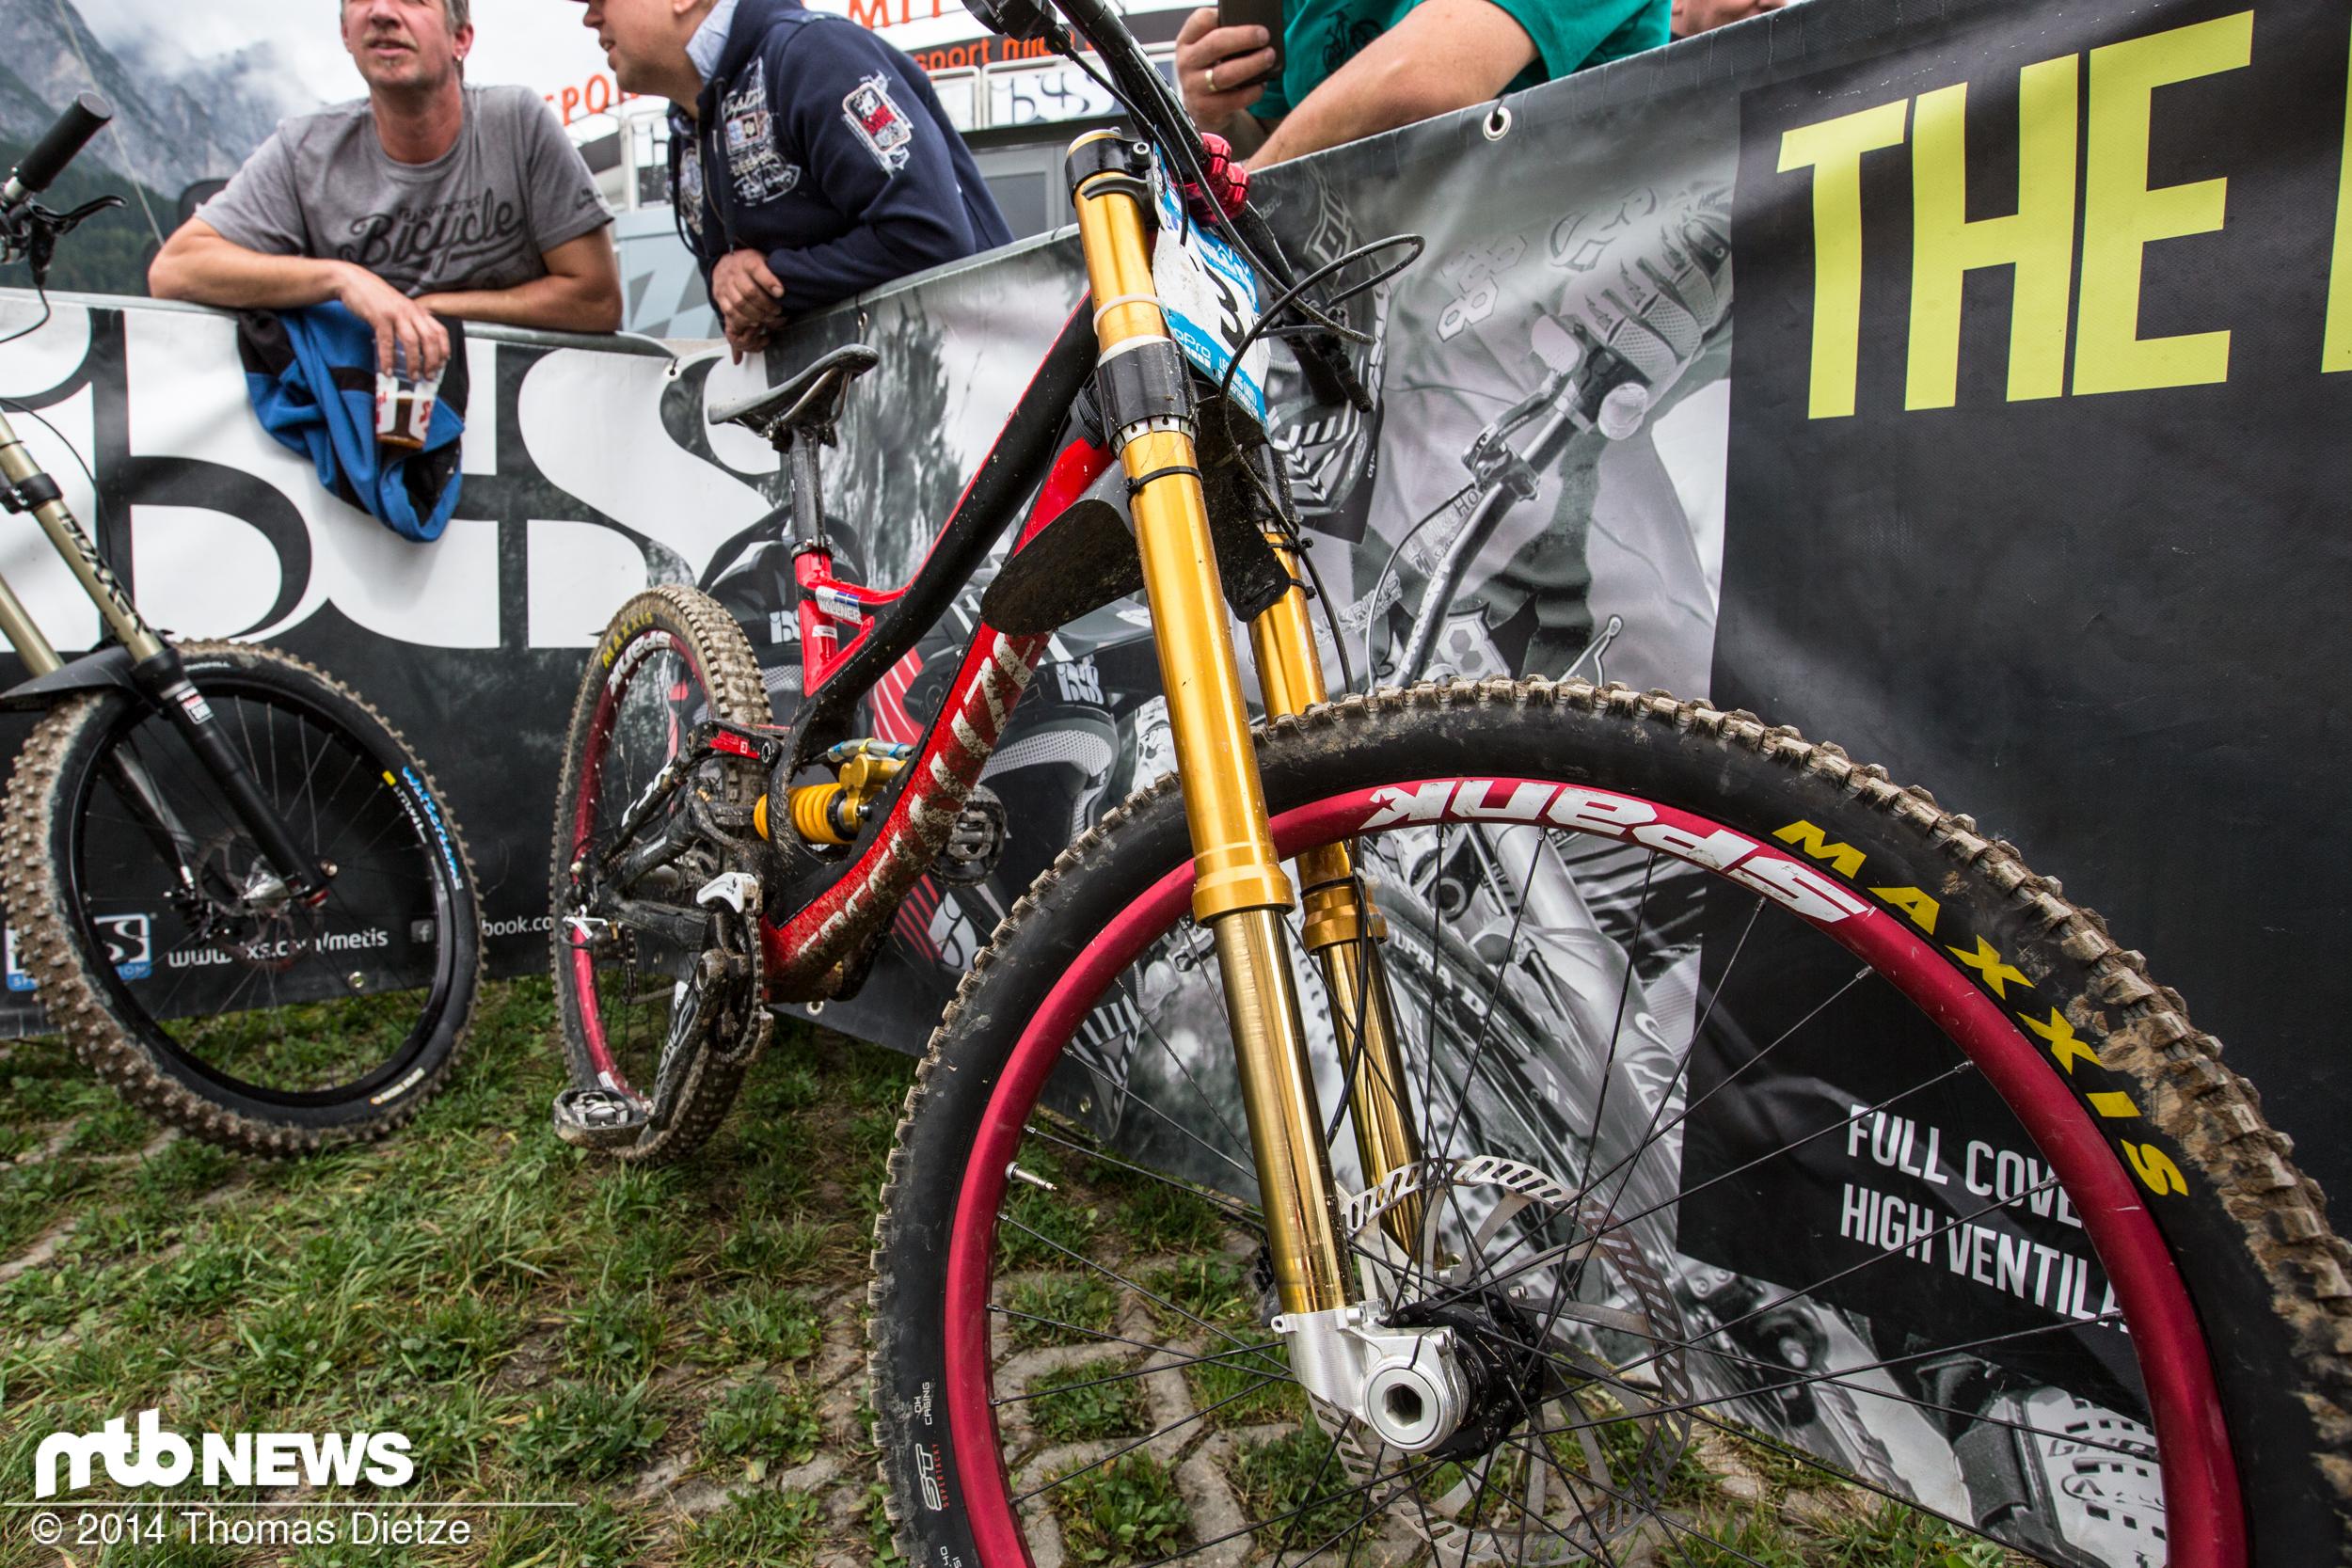 Ducati Forks For Sale